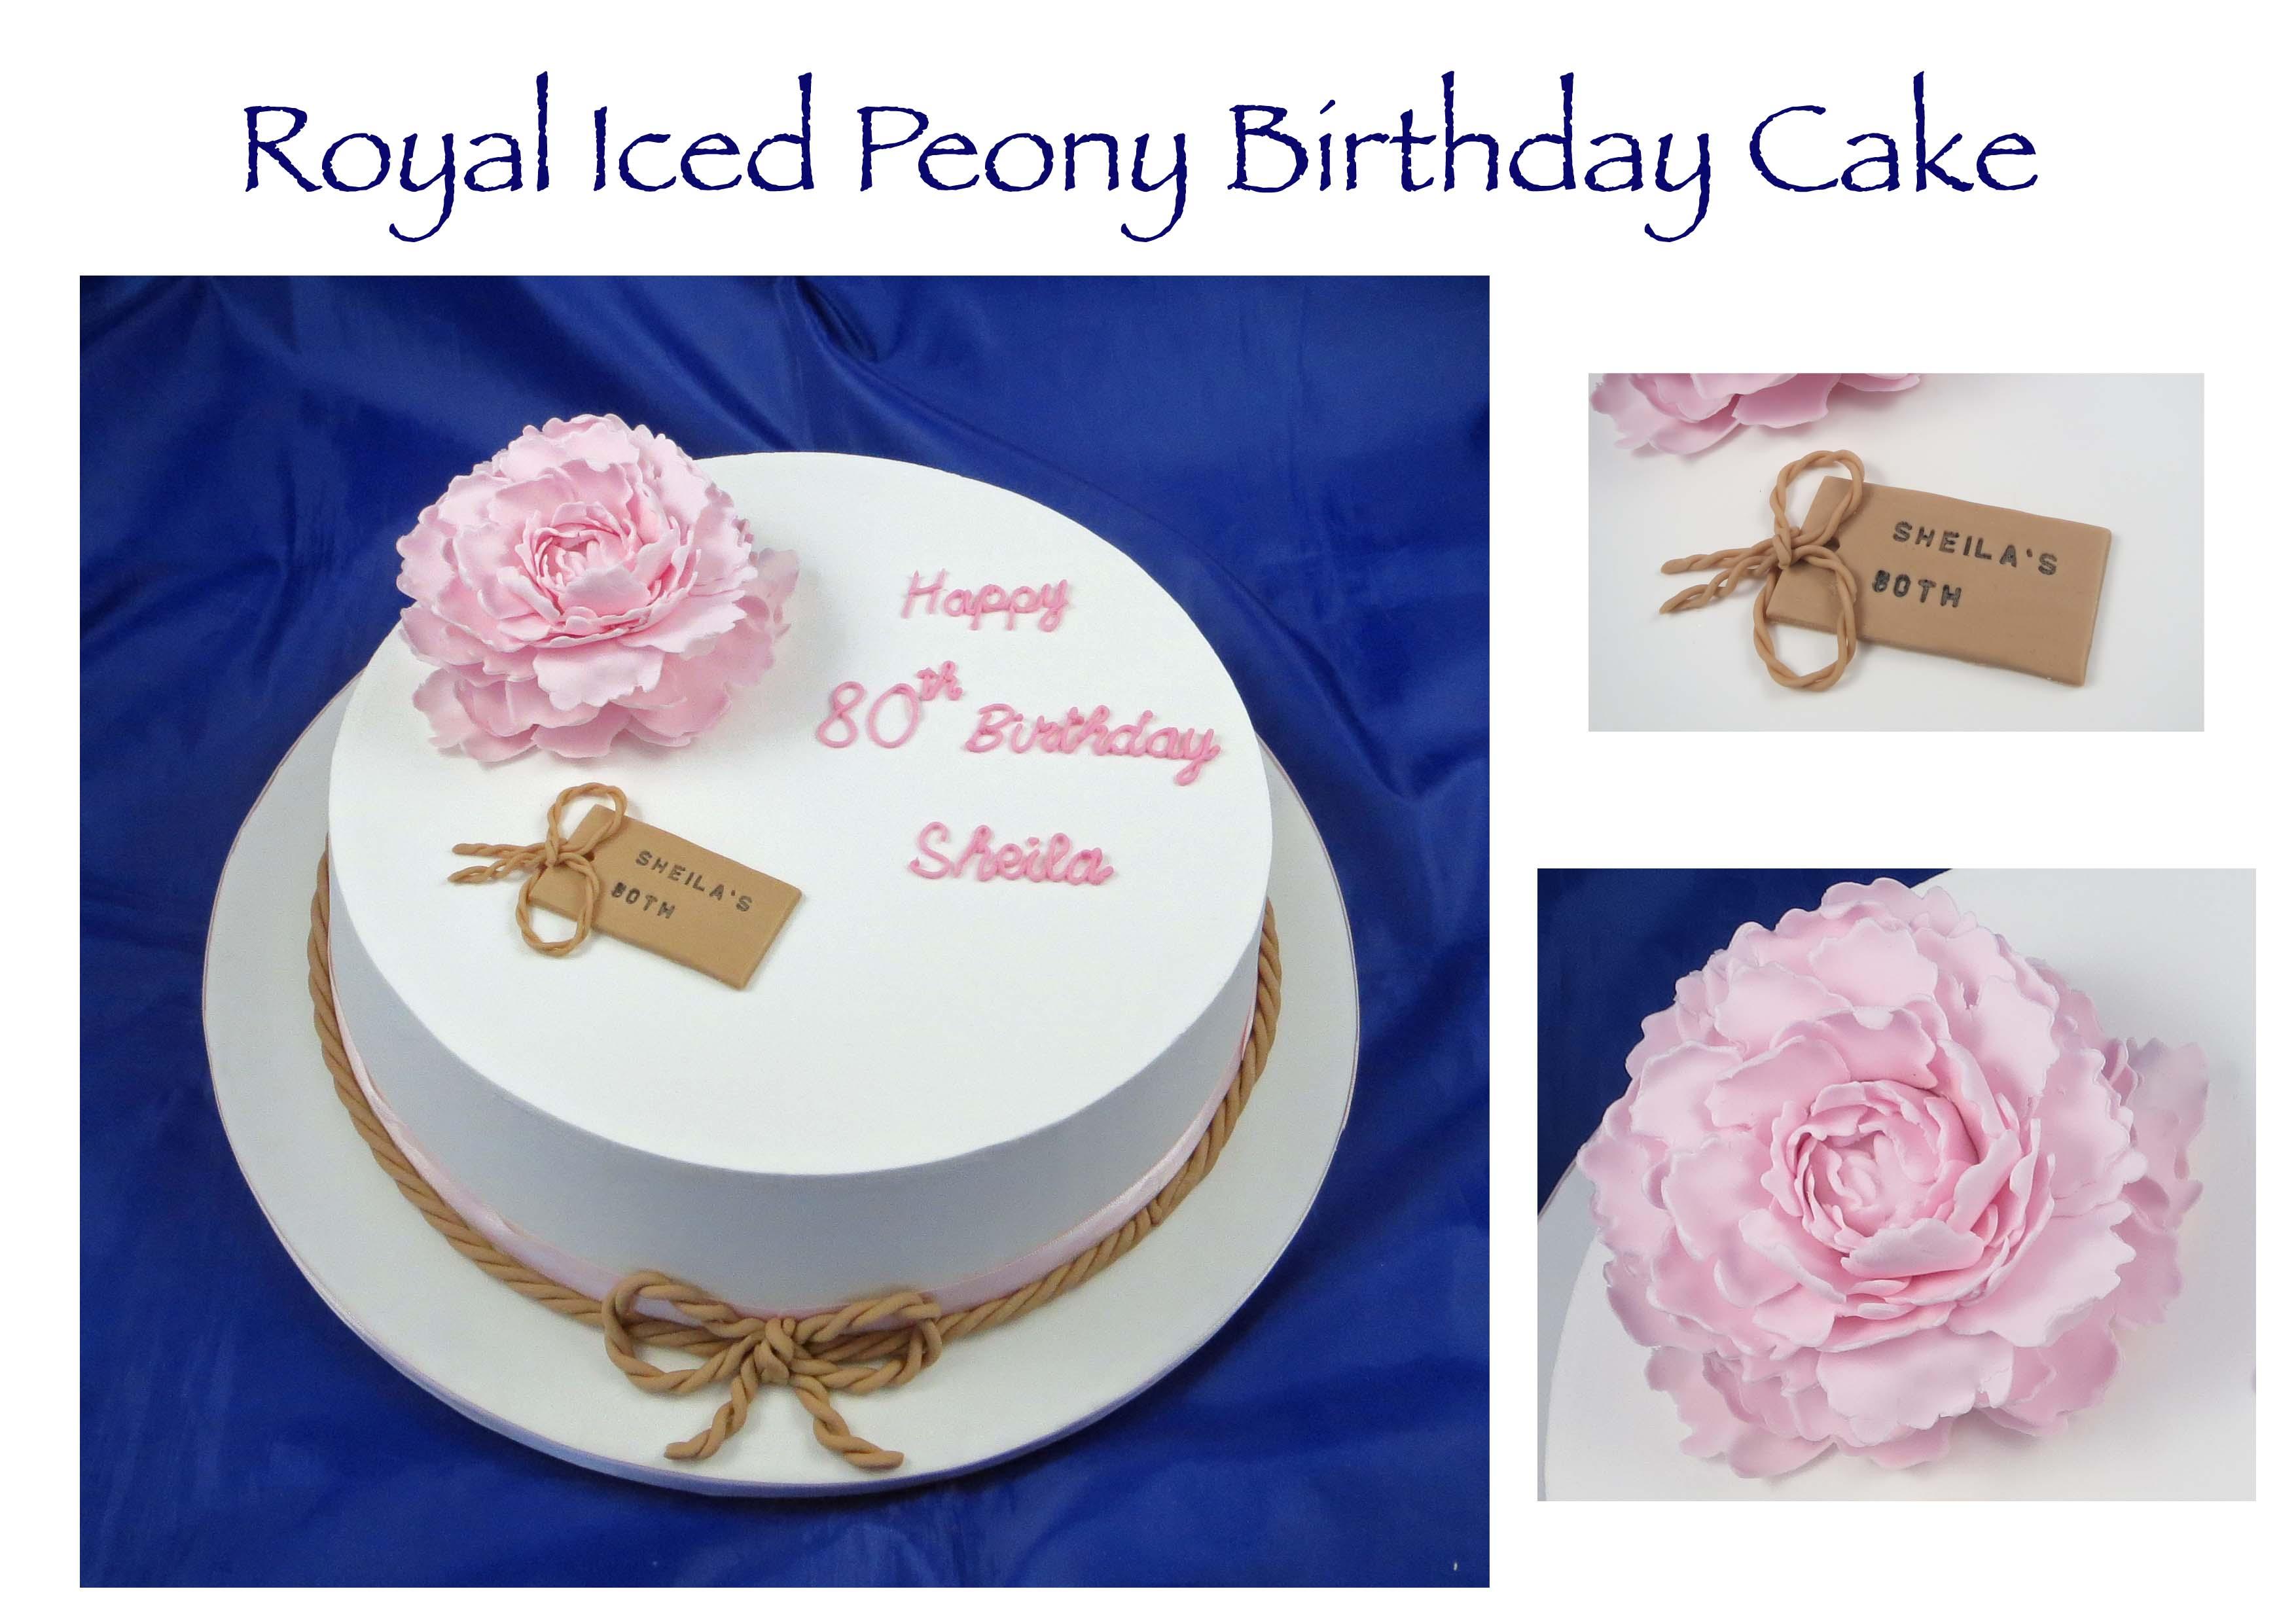 Royal Iced Peony Cake